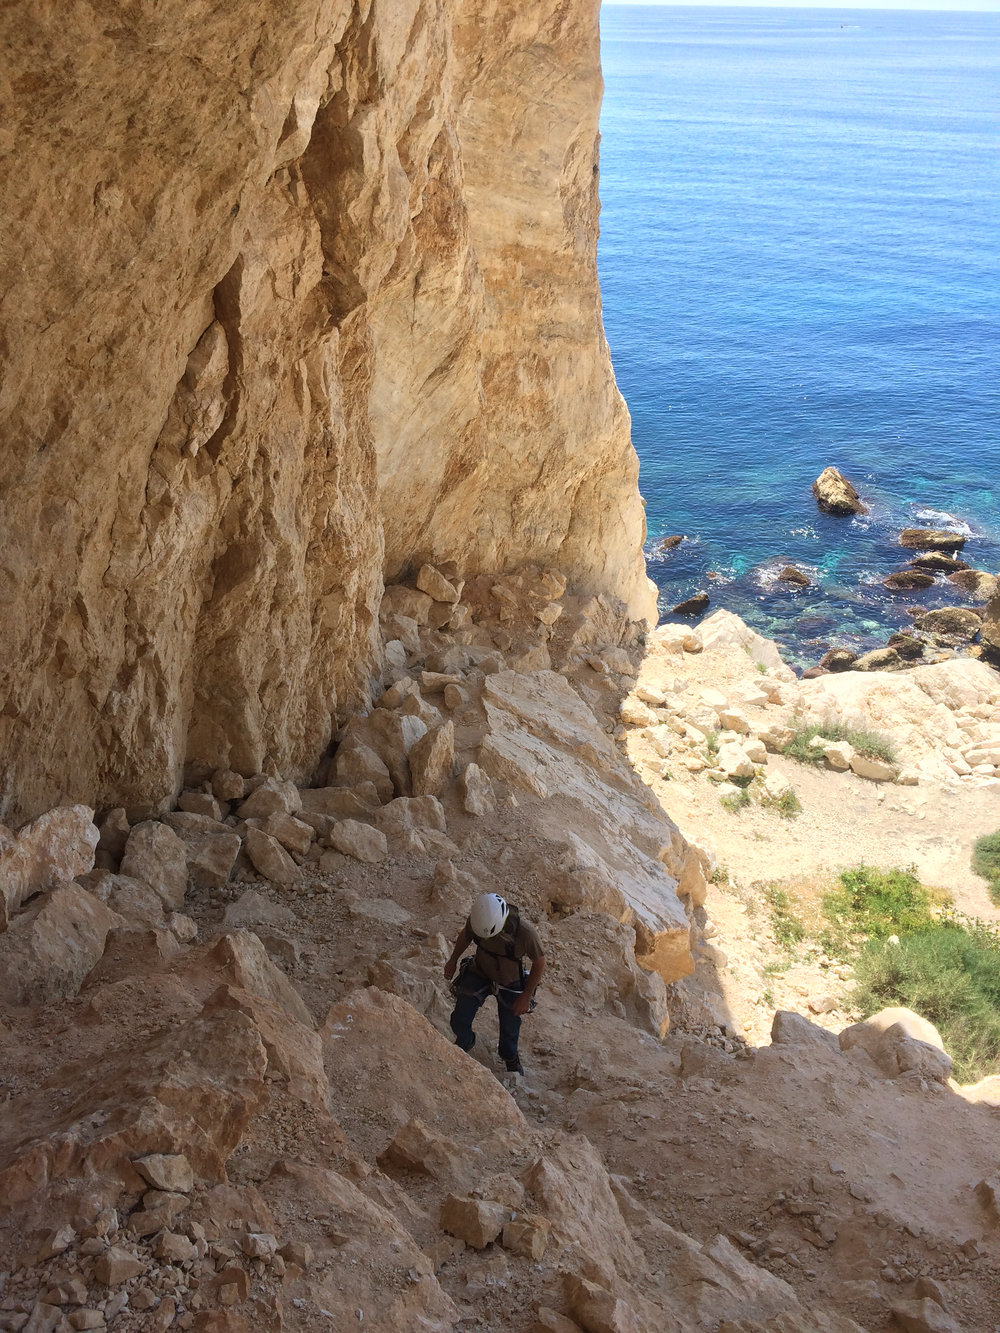 climbinginspain-10.jpg